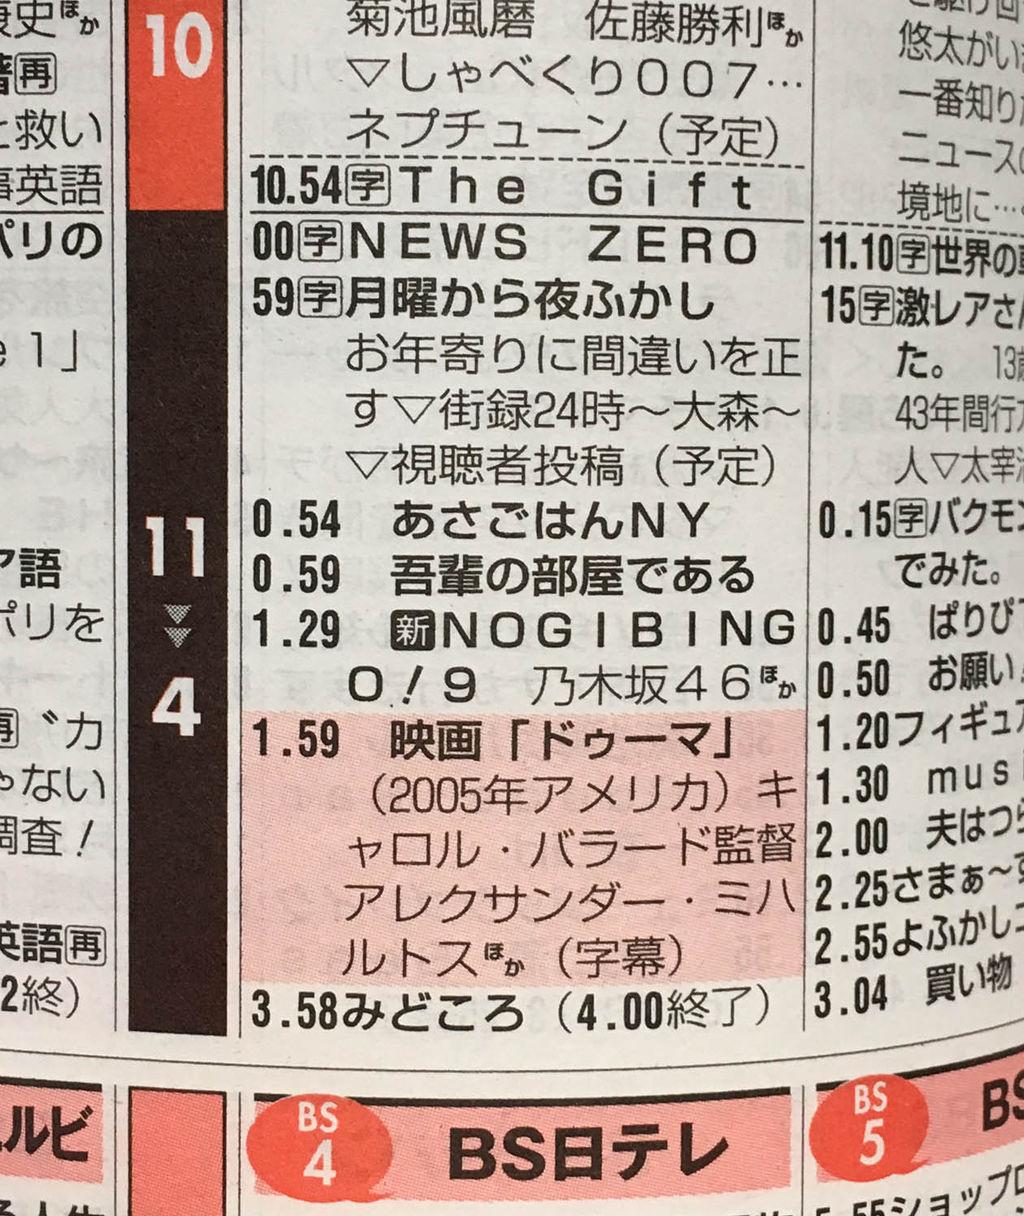 『NOGIBINGO!9』が10月16日から放送開始「乃木坂46ほか」